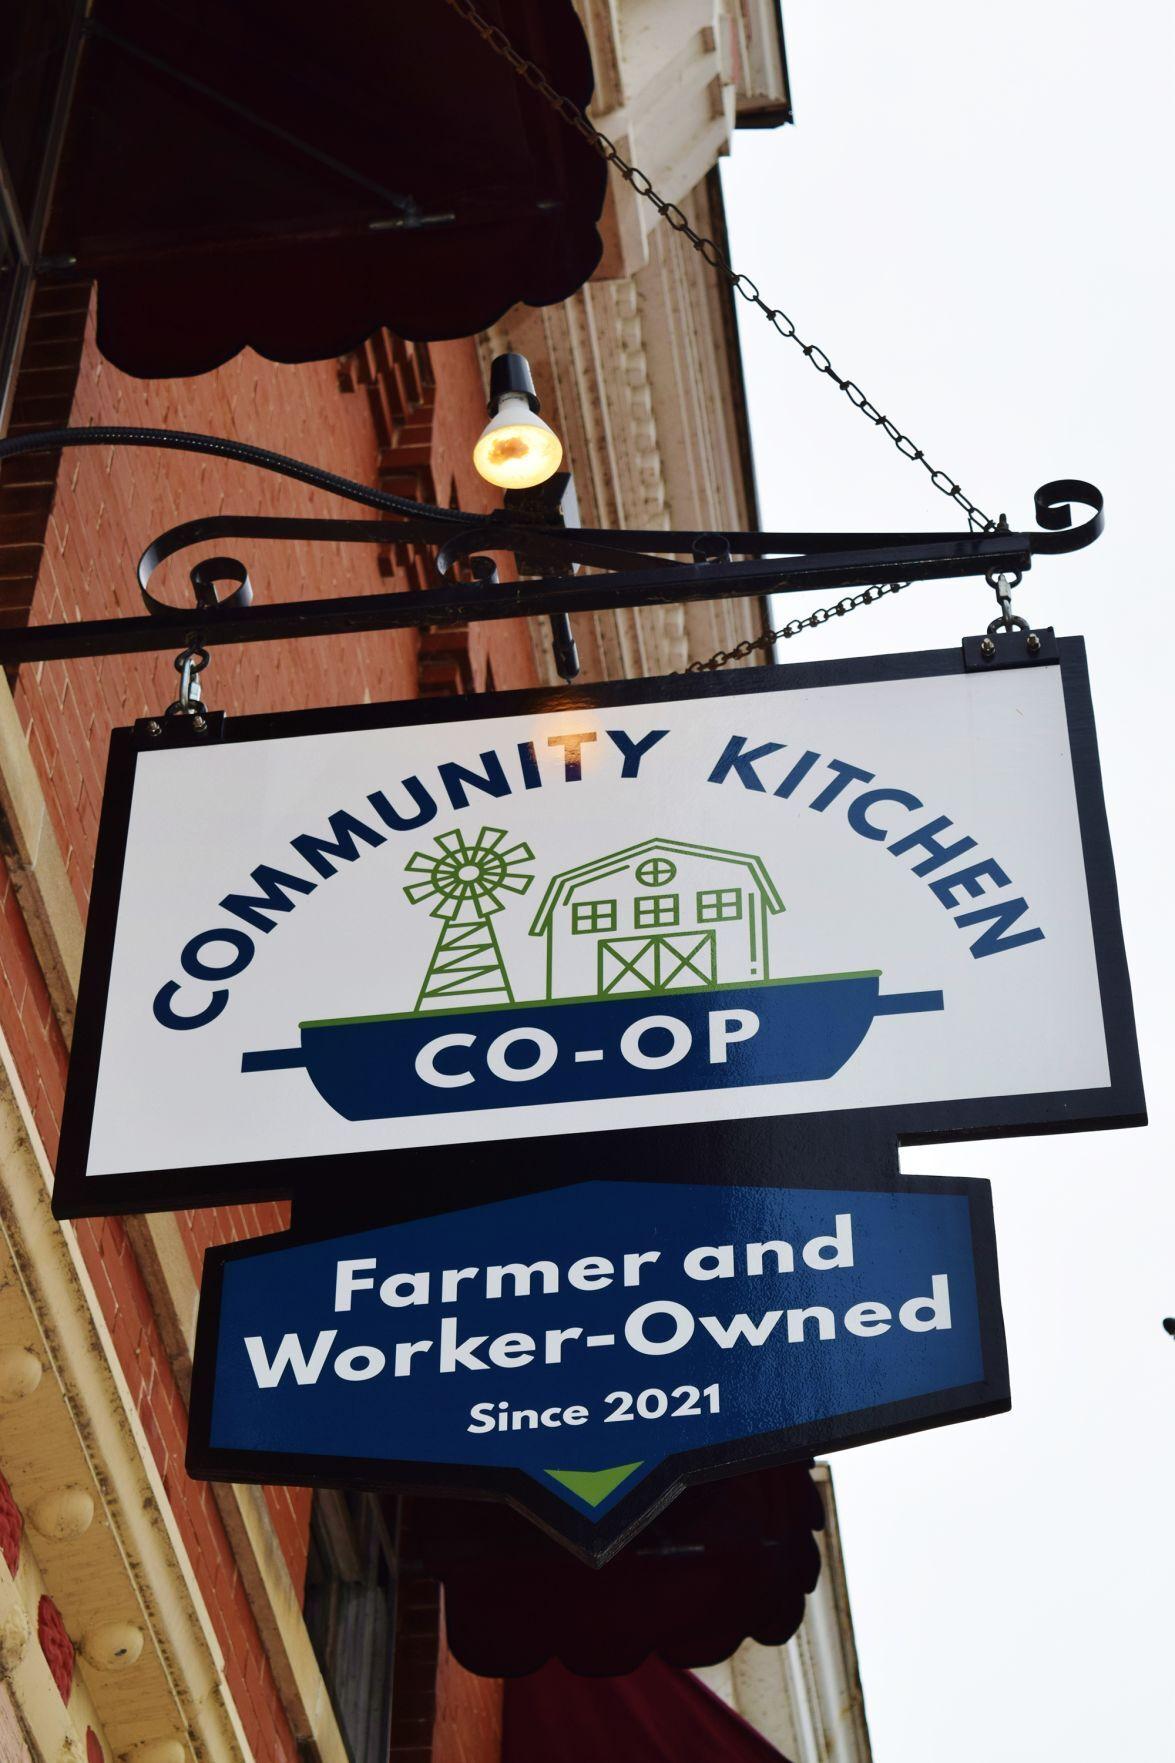 Community Kitchen Co-op sign